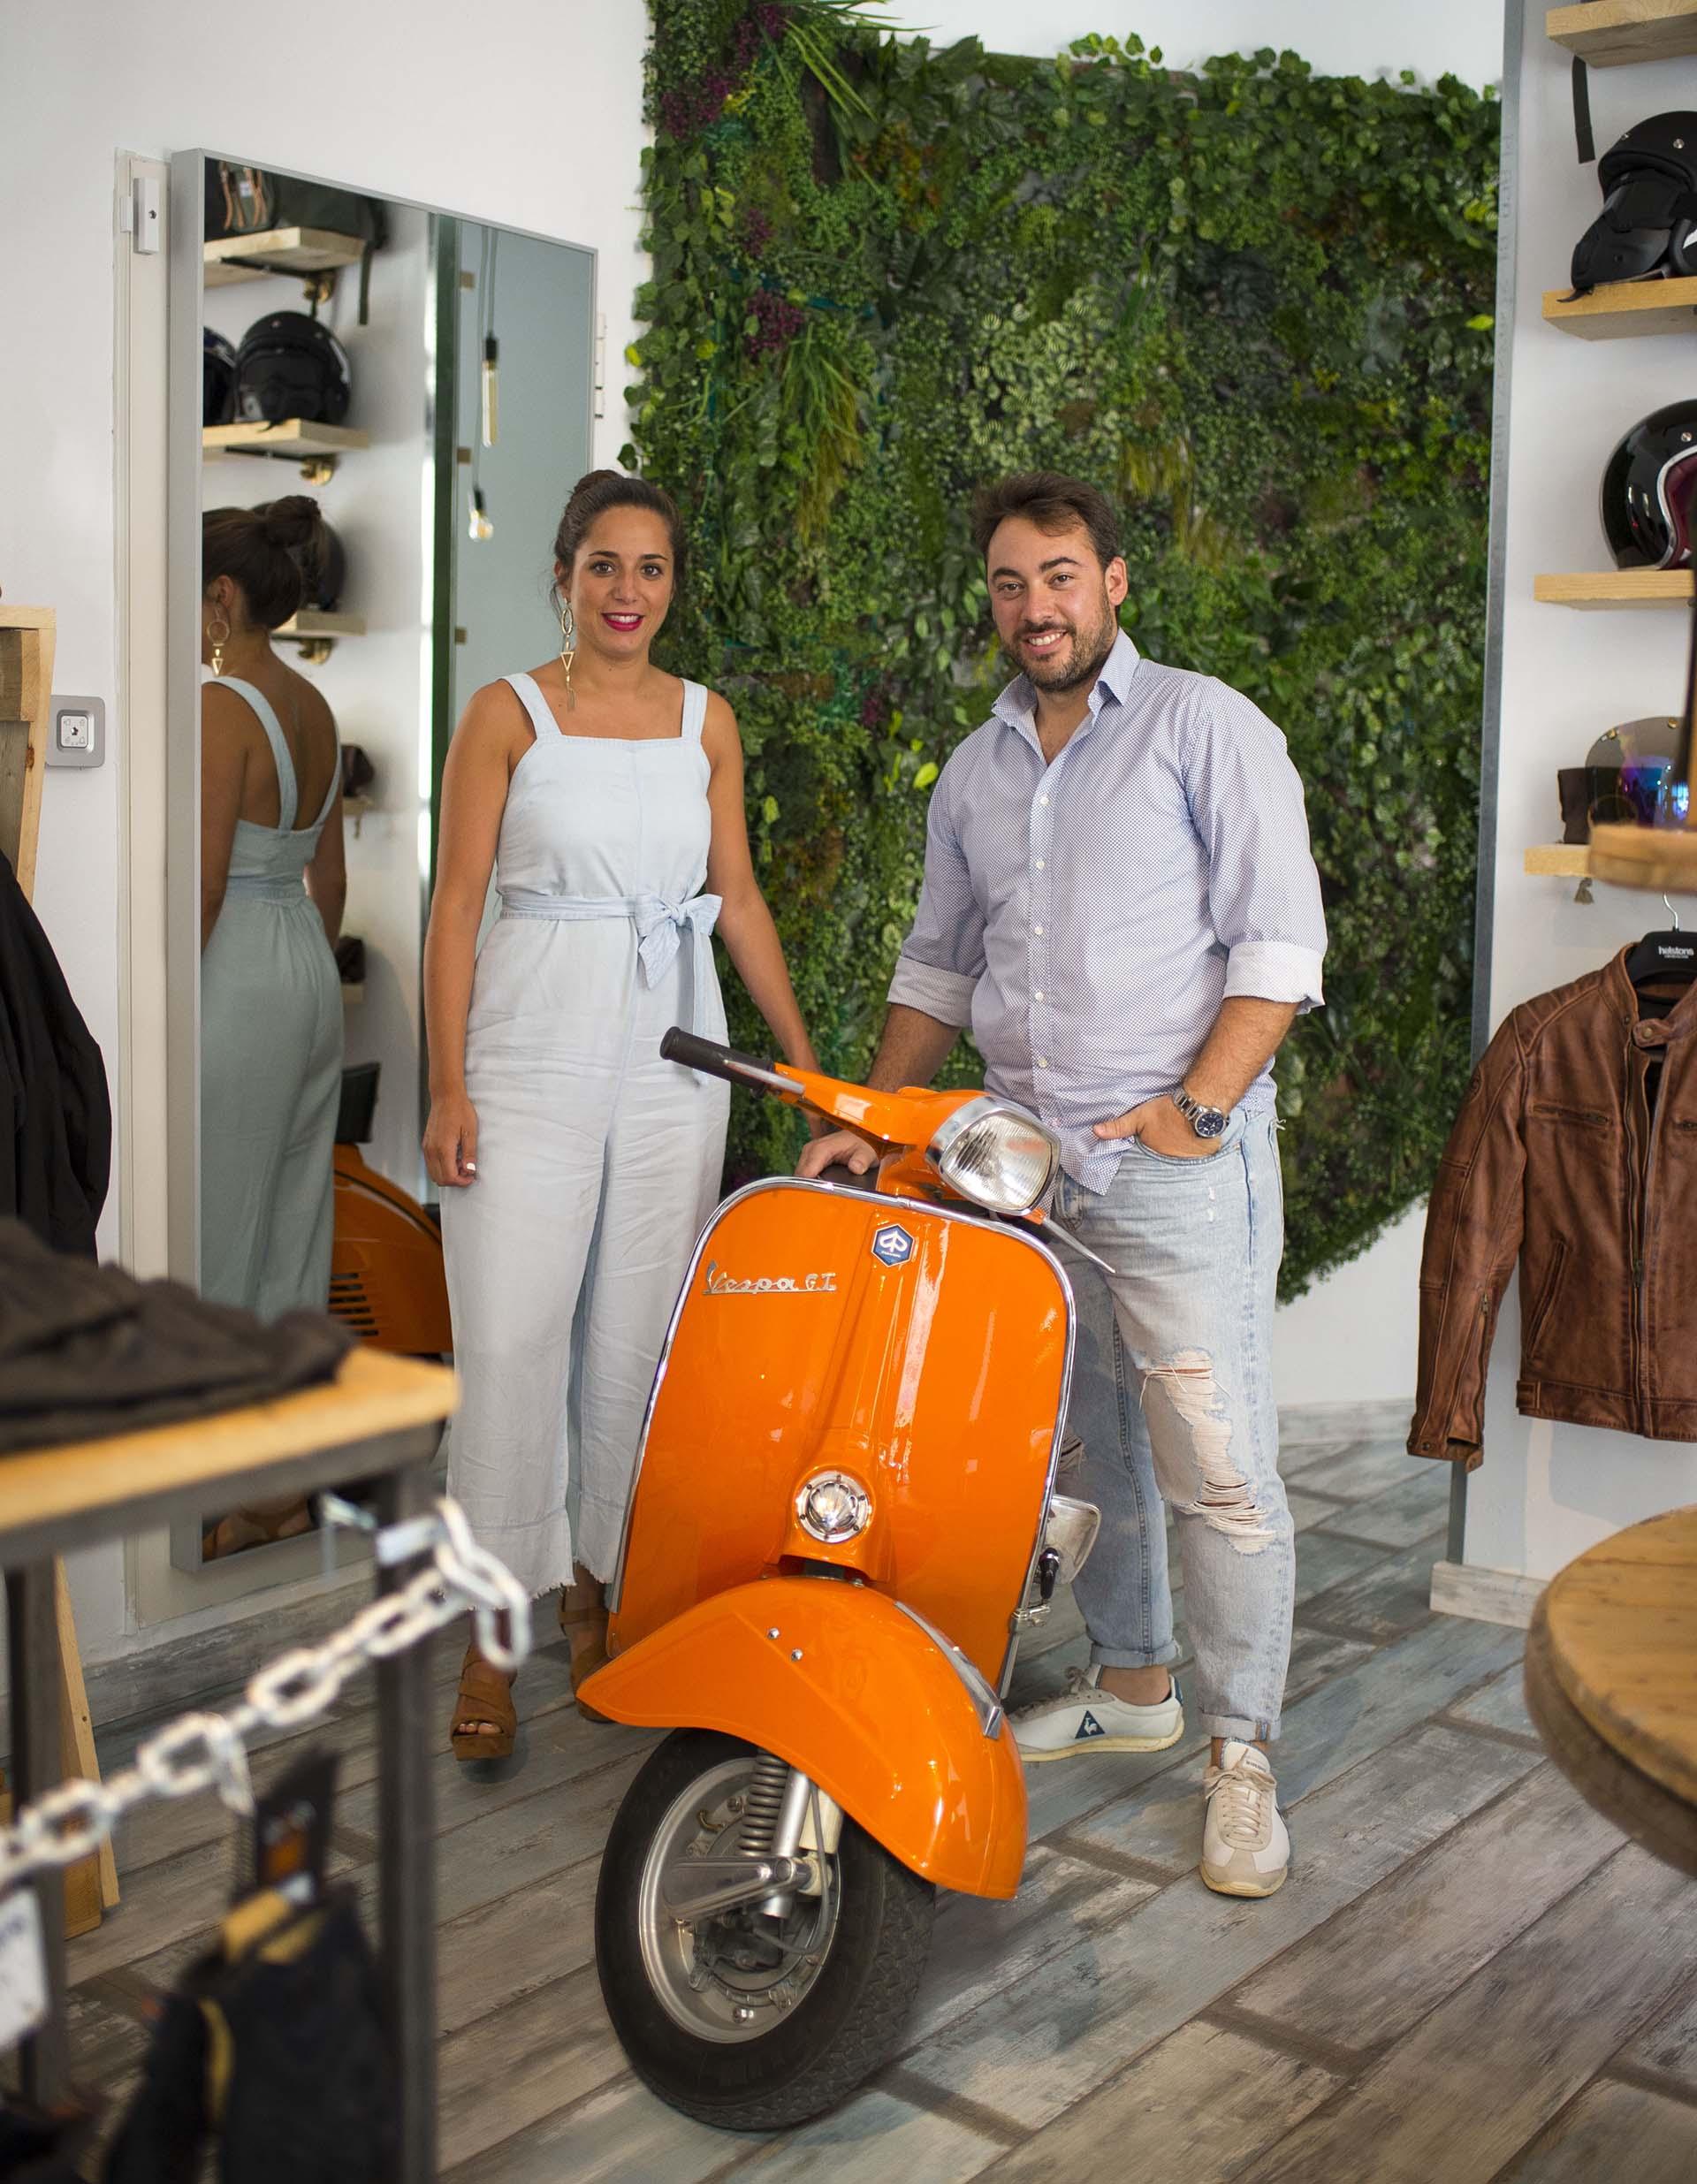 Irons Cafe Racer complementos para moteros en Madrid